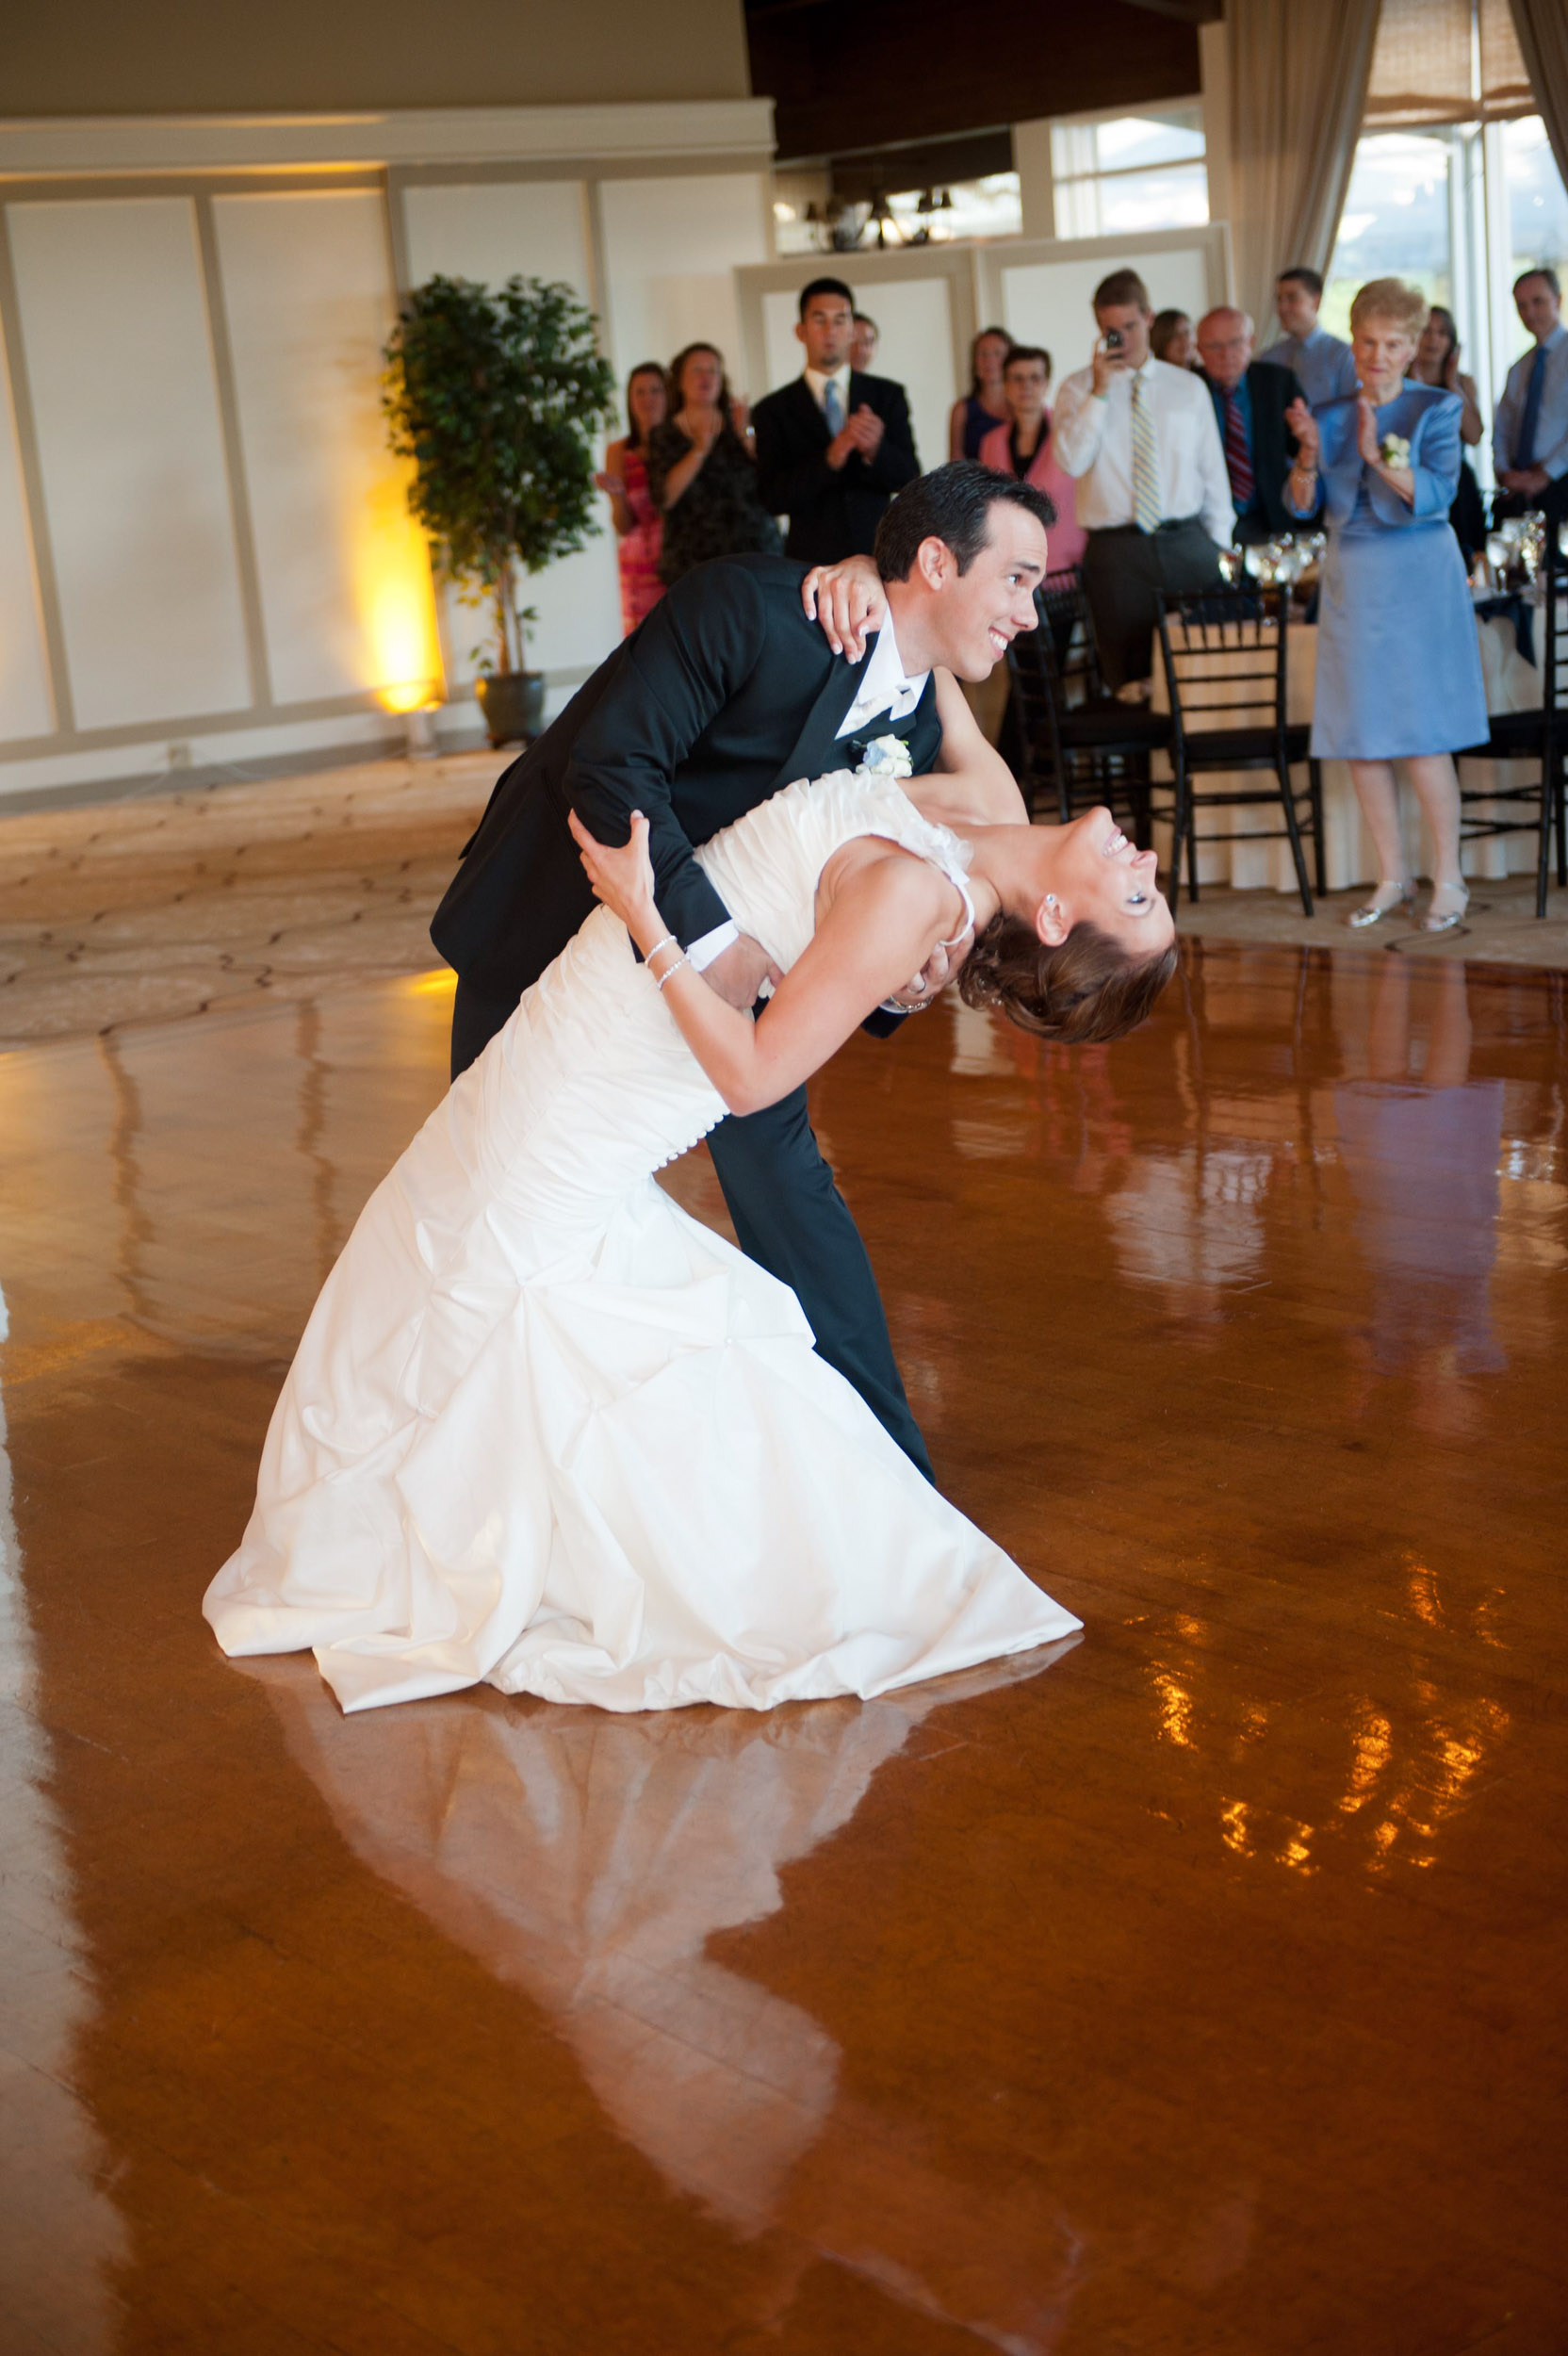 Wedding68_DSC1654-2.jpg